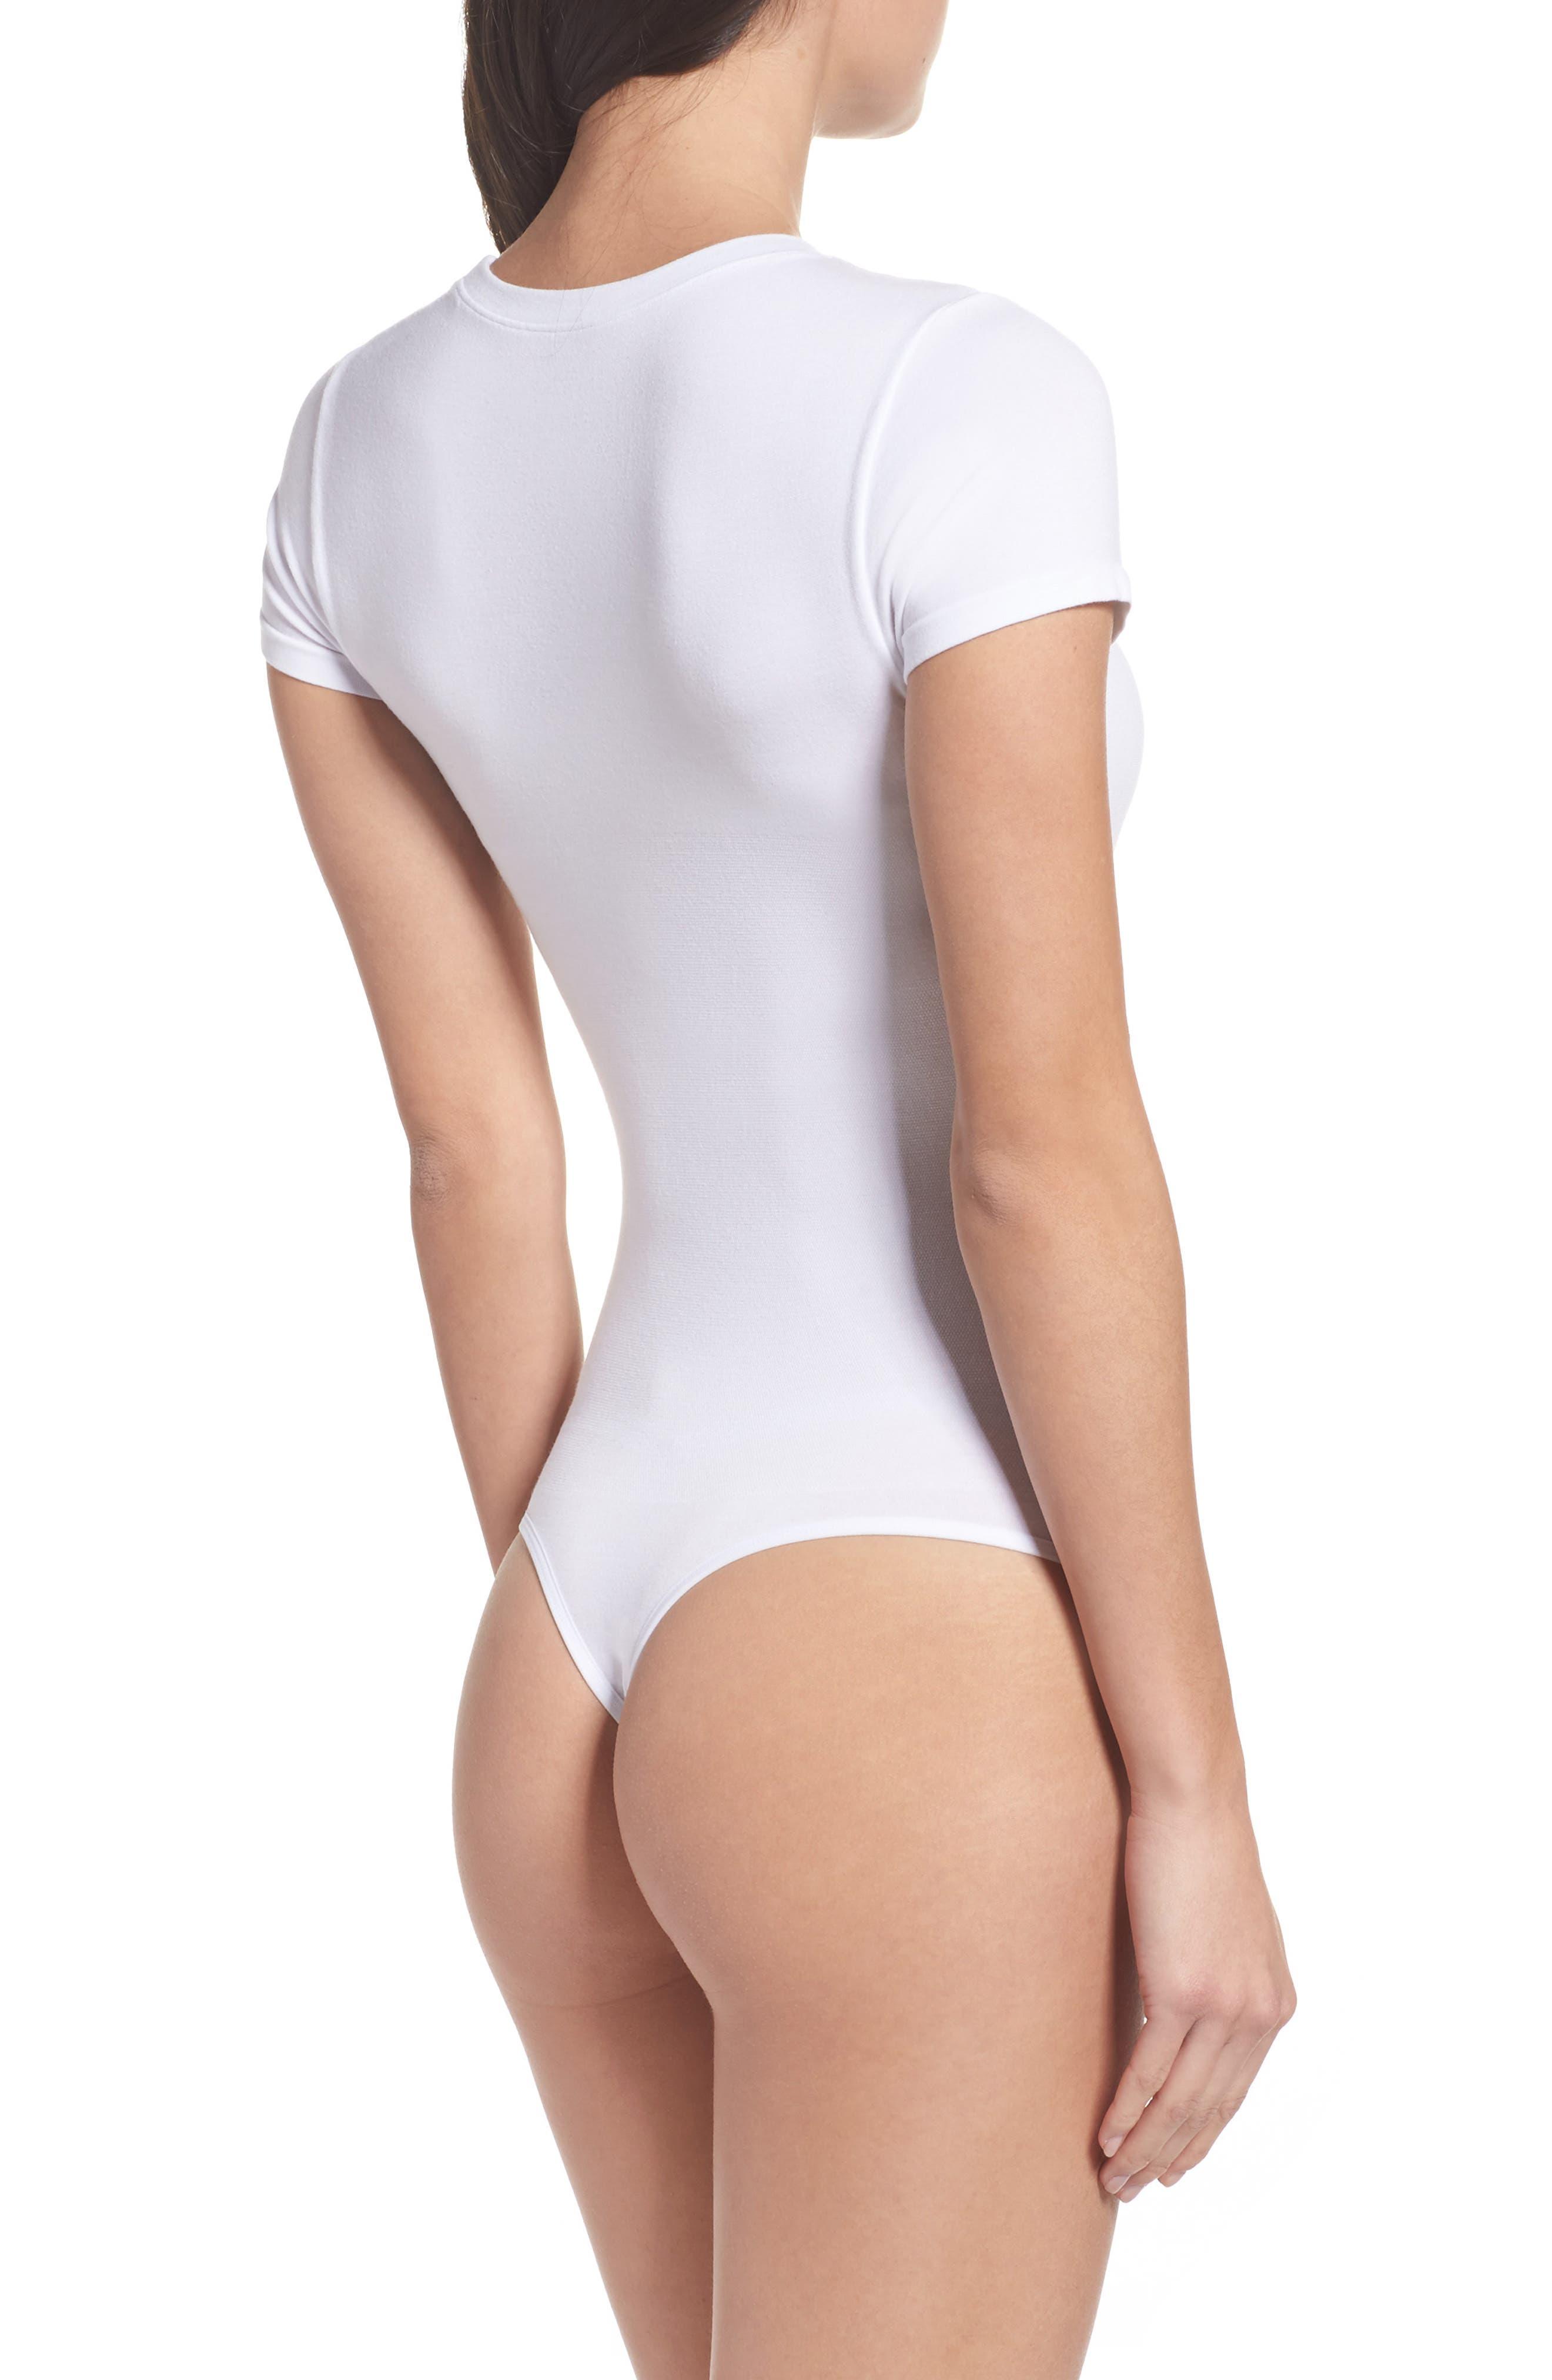 71afcefad9 Women's Bodysuits | Nordstrom